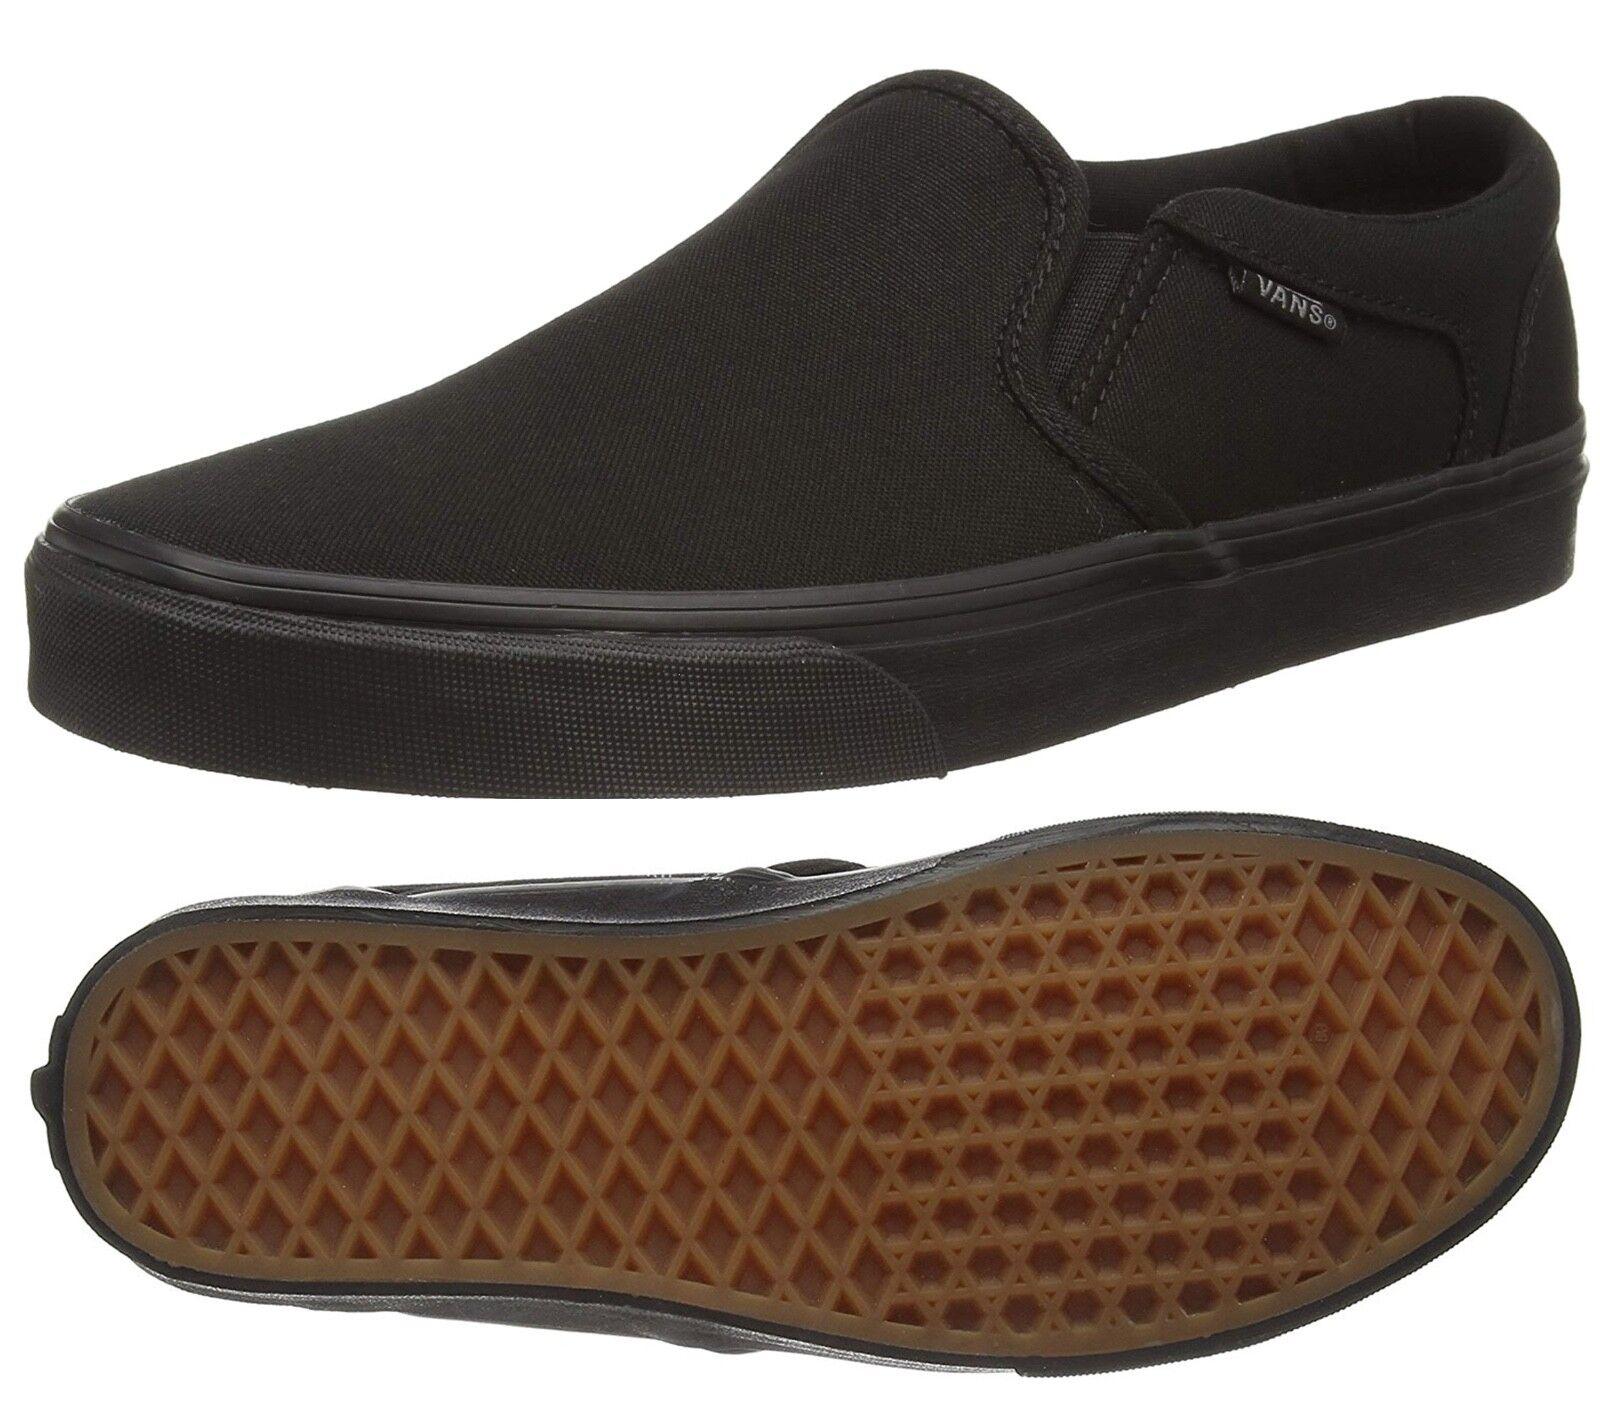 VANS Asher Mens Canvas Skater Trainers Plain schwarz Schuhes Slip On Plimsolls schwarz Plain 4ab7c4